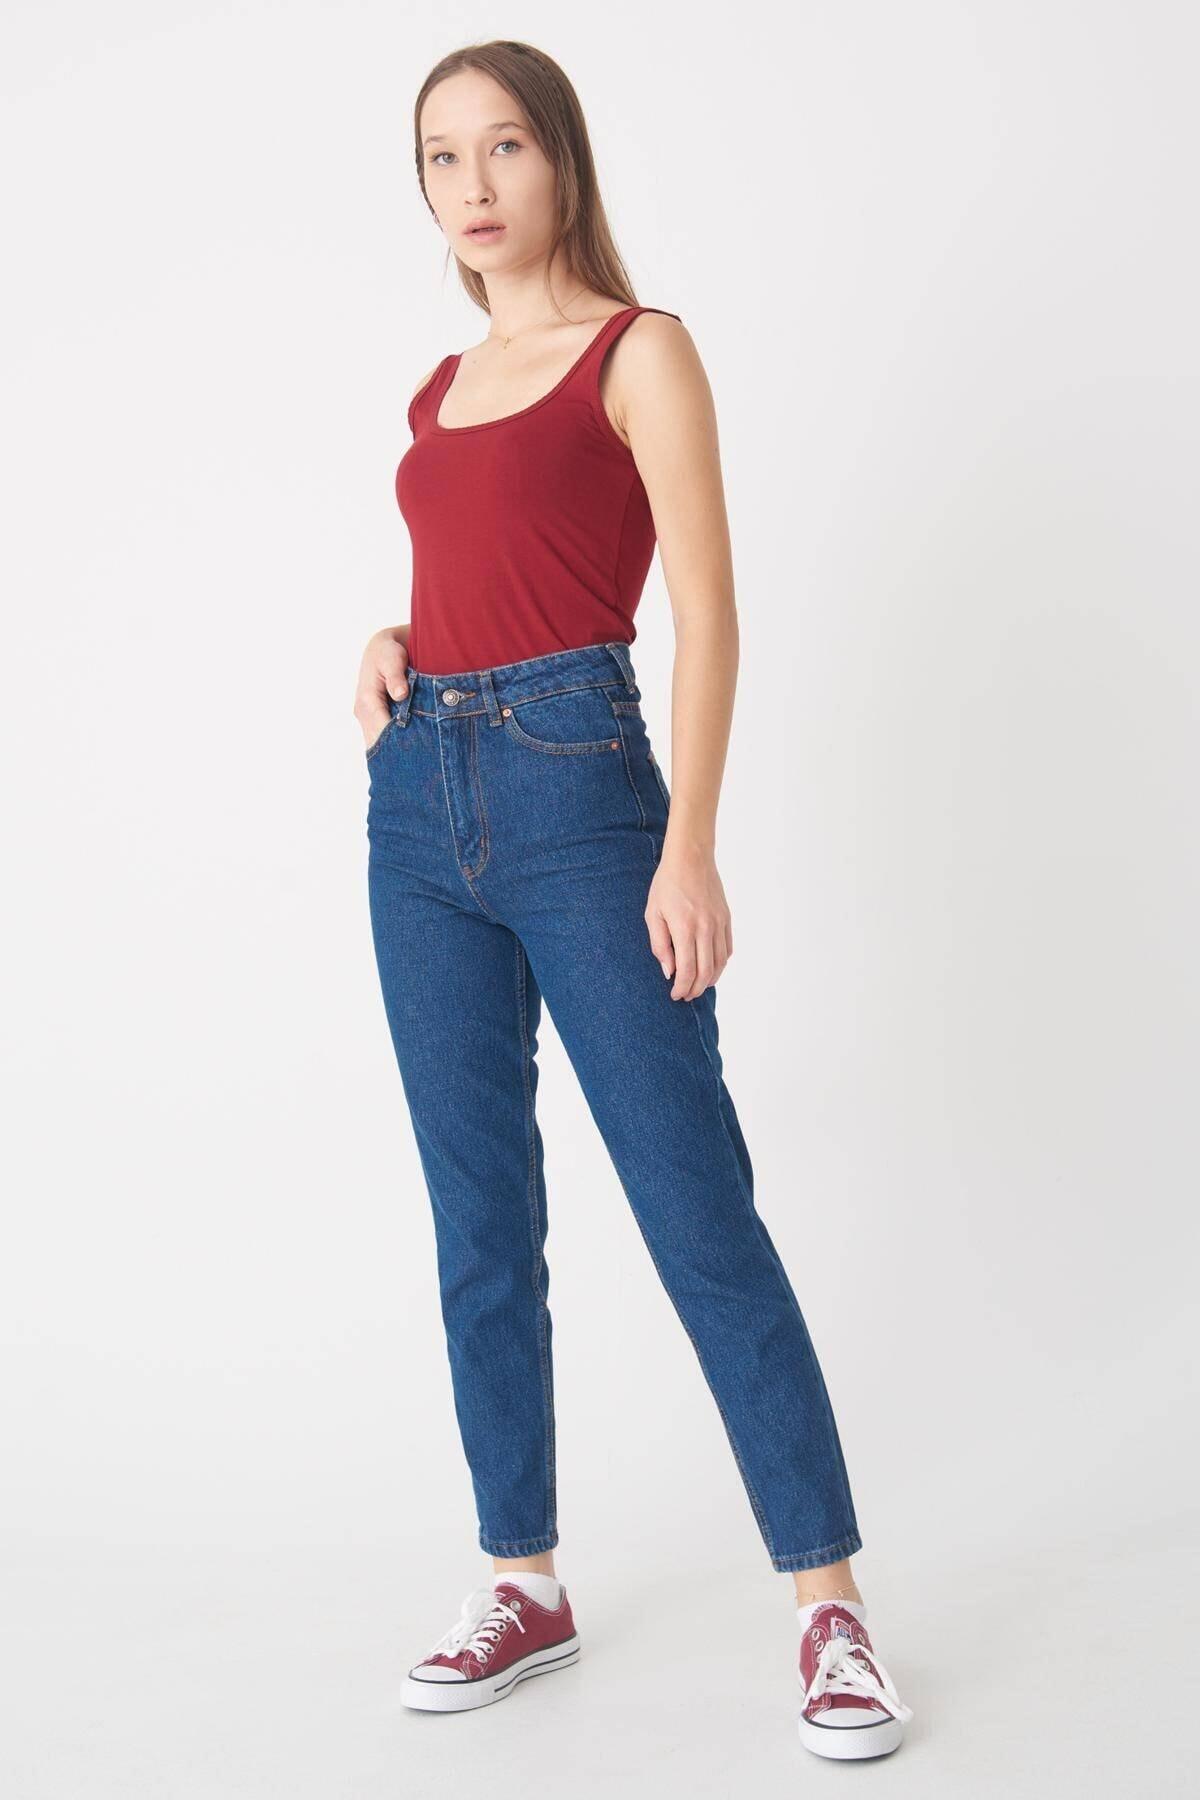 Addax Kadın Koyu Kot Rengi Mom Jean Pantolon Pn3360 - Pnr Adx-0000022490 1